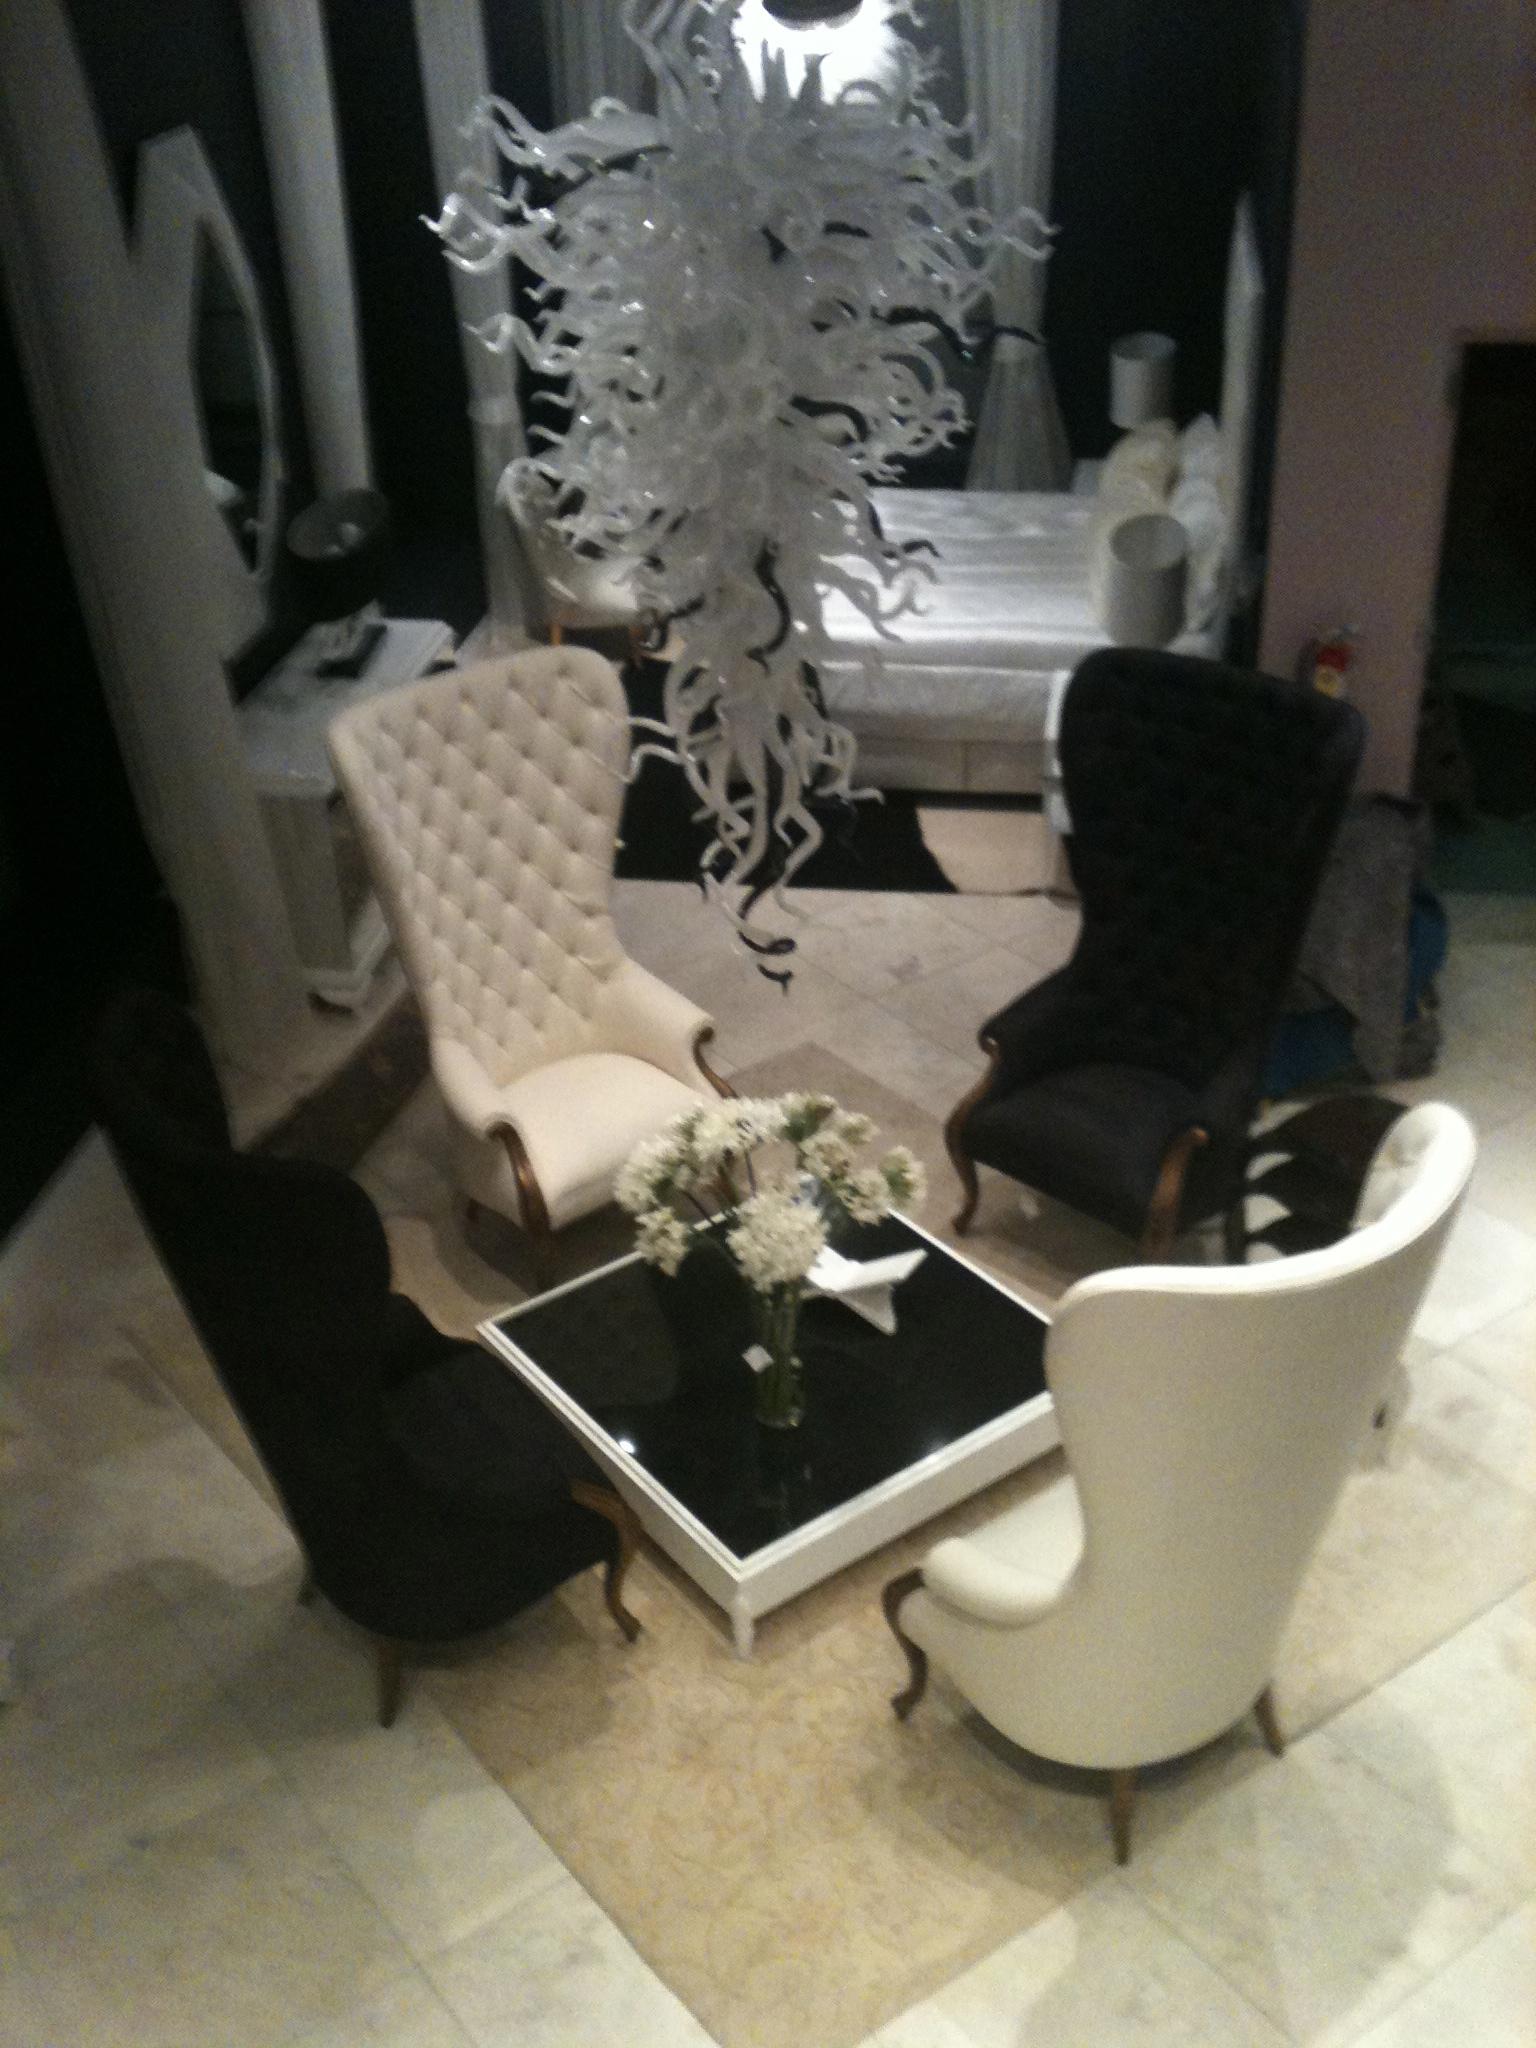 alice in wonderland chair swivel tub furniture fit for mademoiselle vlv designs